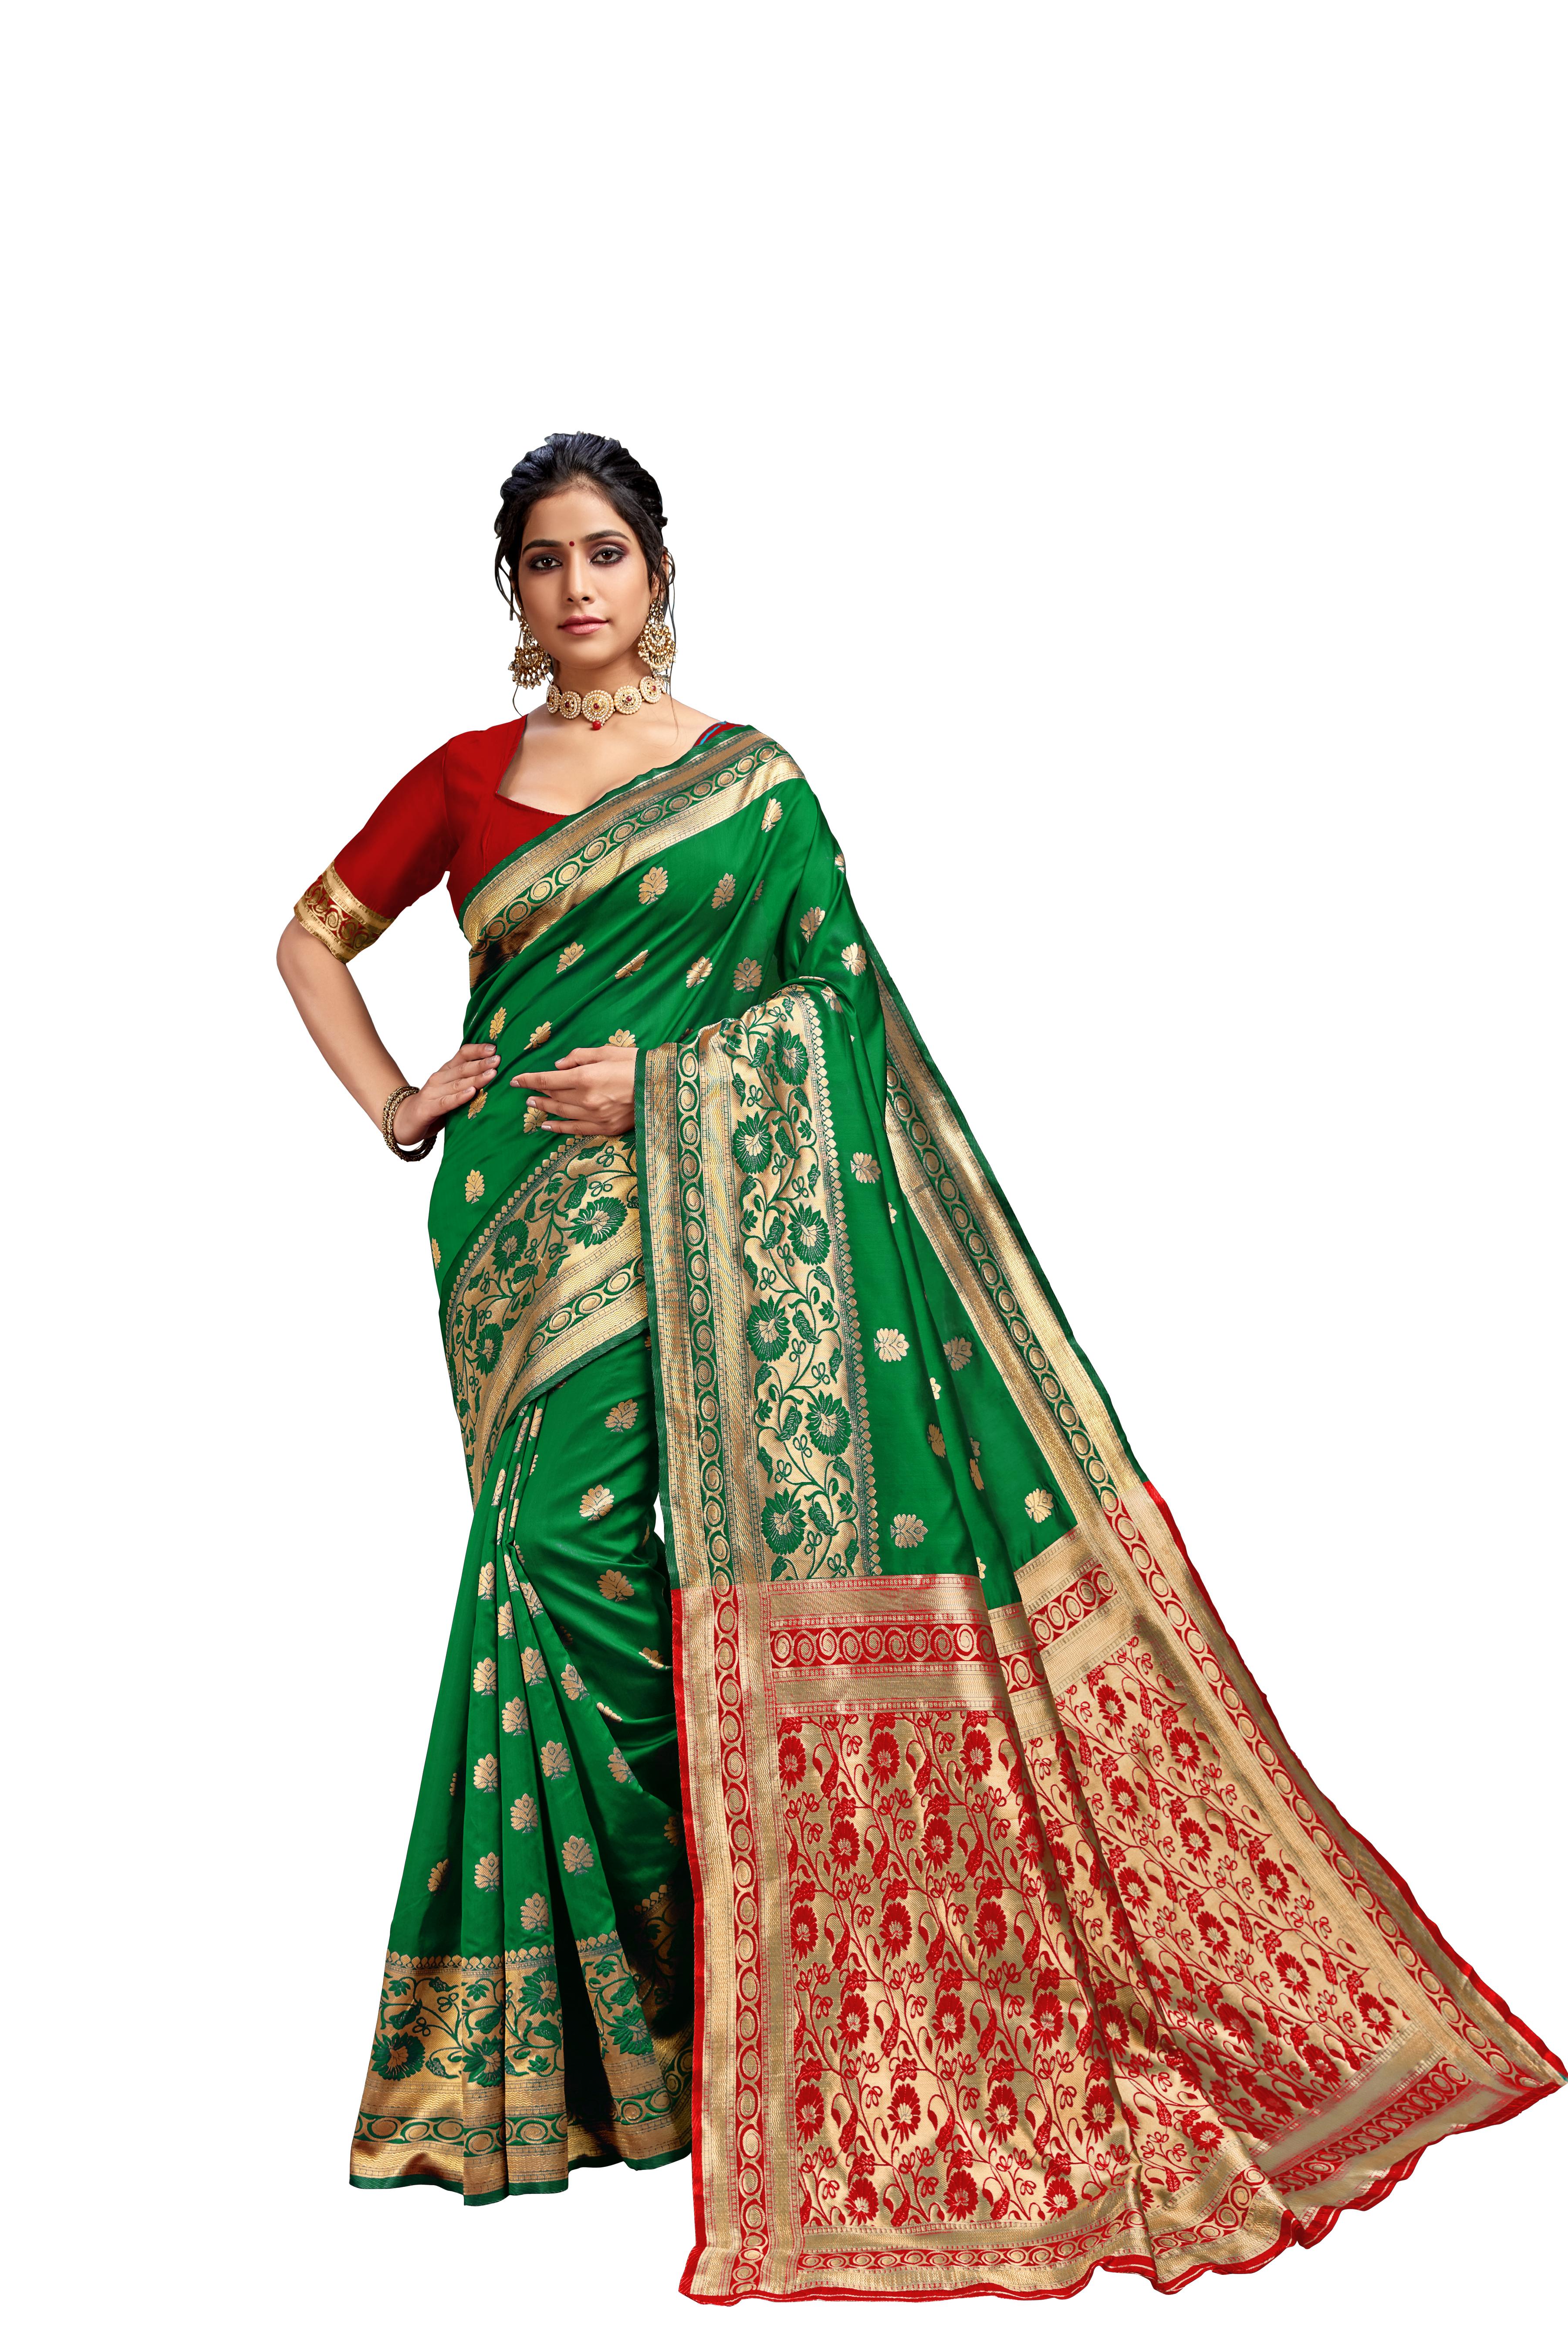 Glemora   Glemora Green & Red Lichi Cotton Kalpana Saree With Unstitched Blouse